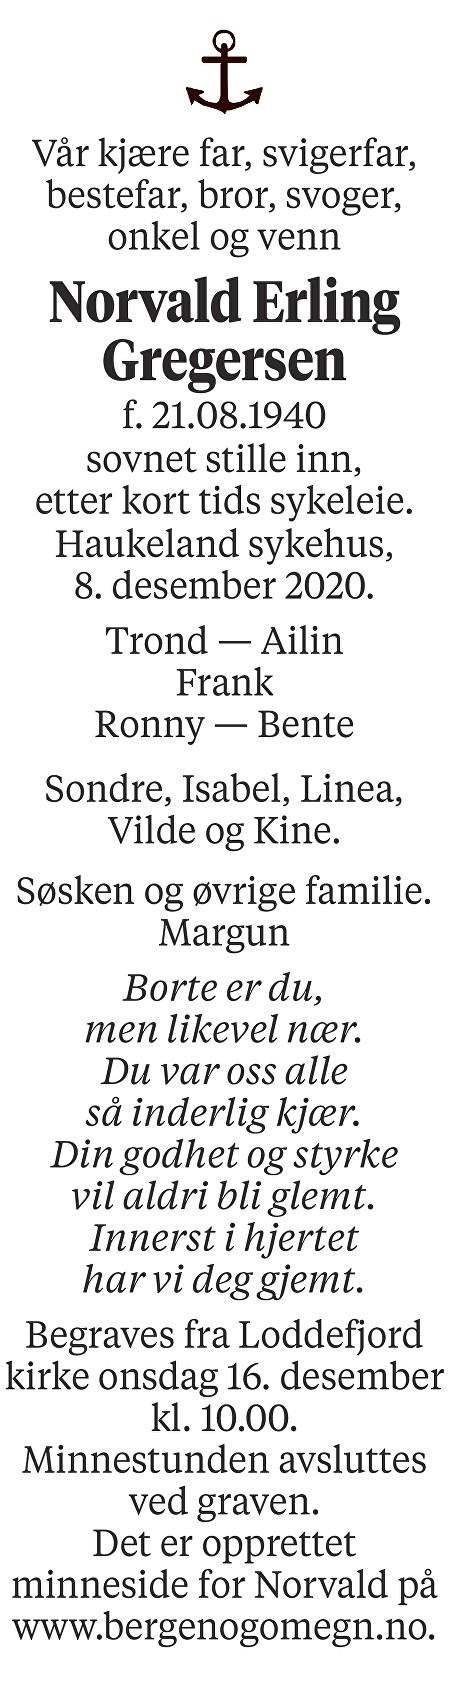 Norvald Erling Gregersen Dødsannonse